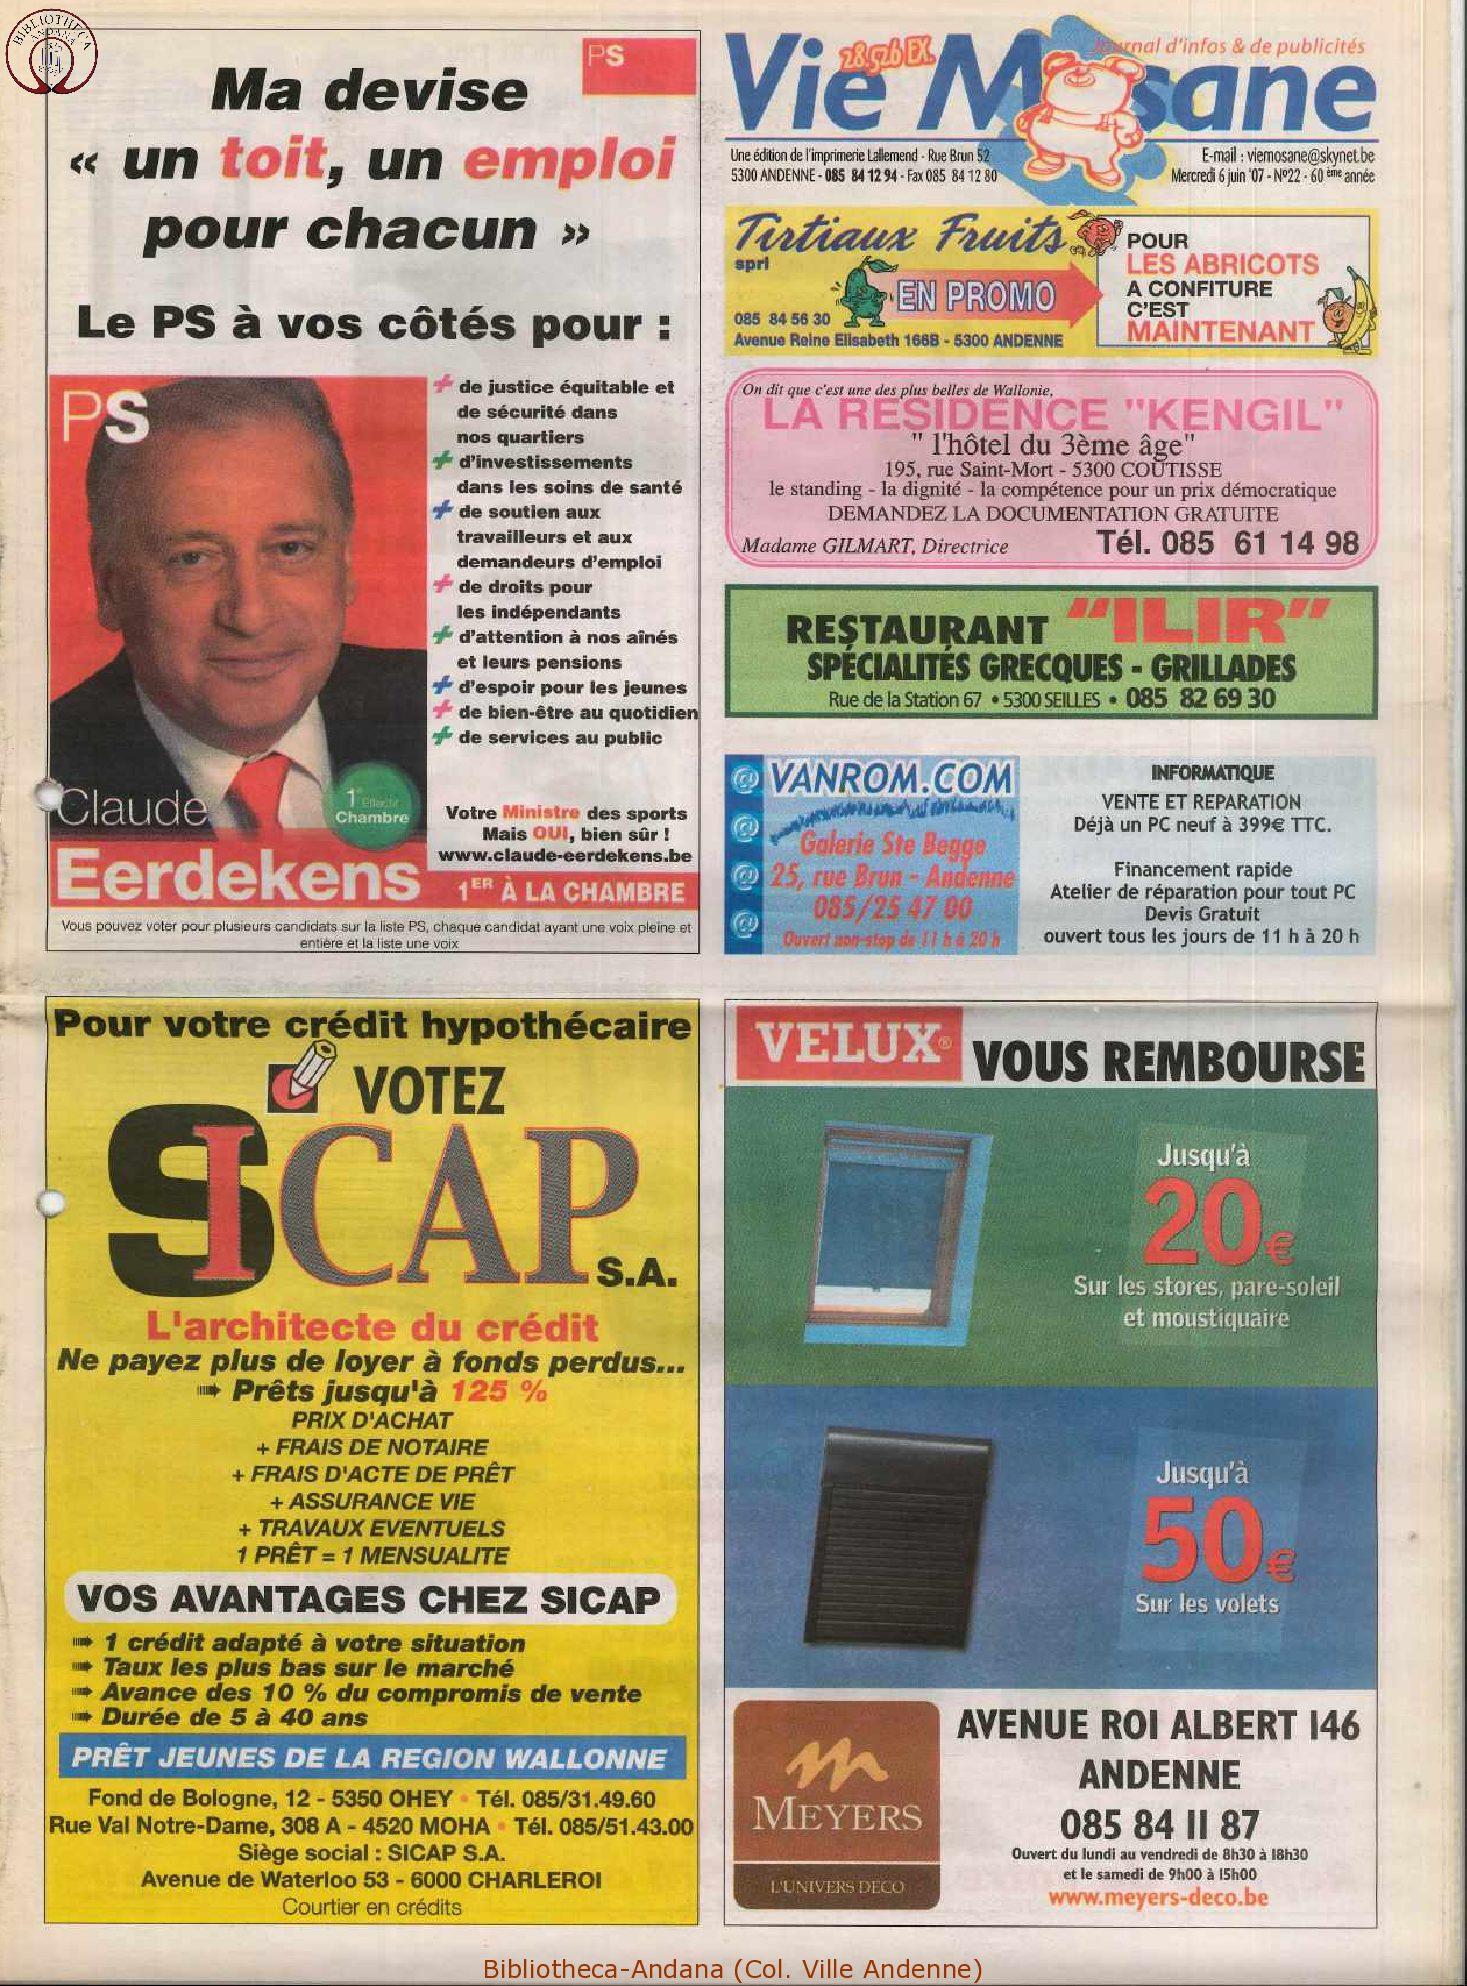 60e année - n°22 - 6 juin 2007